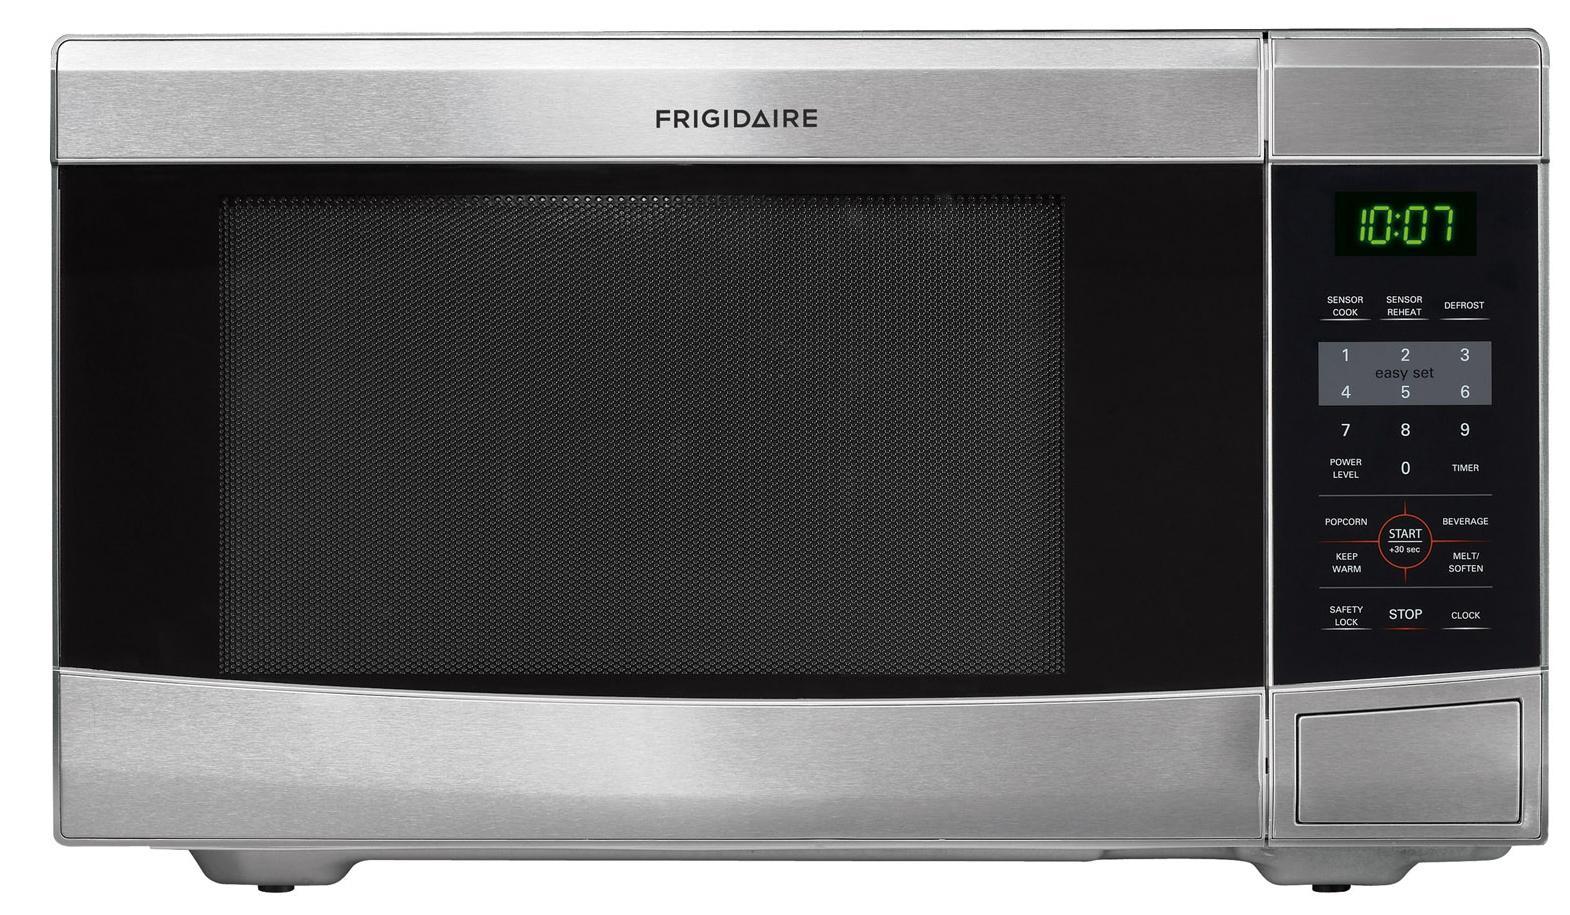 Frigidaire Microwaves 1.1 Cu. Ft. Countertop Microwave - Item Number ...